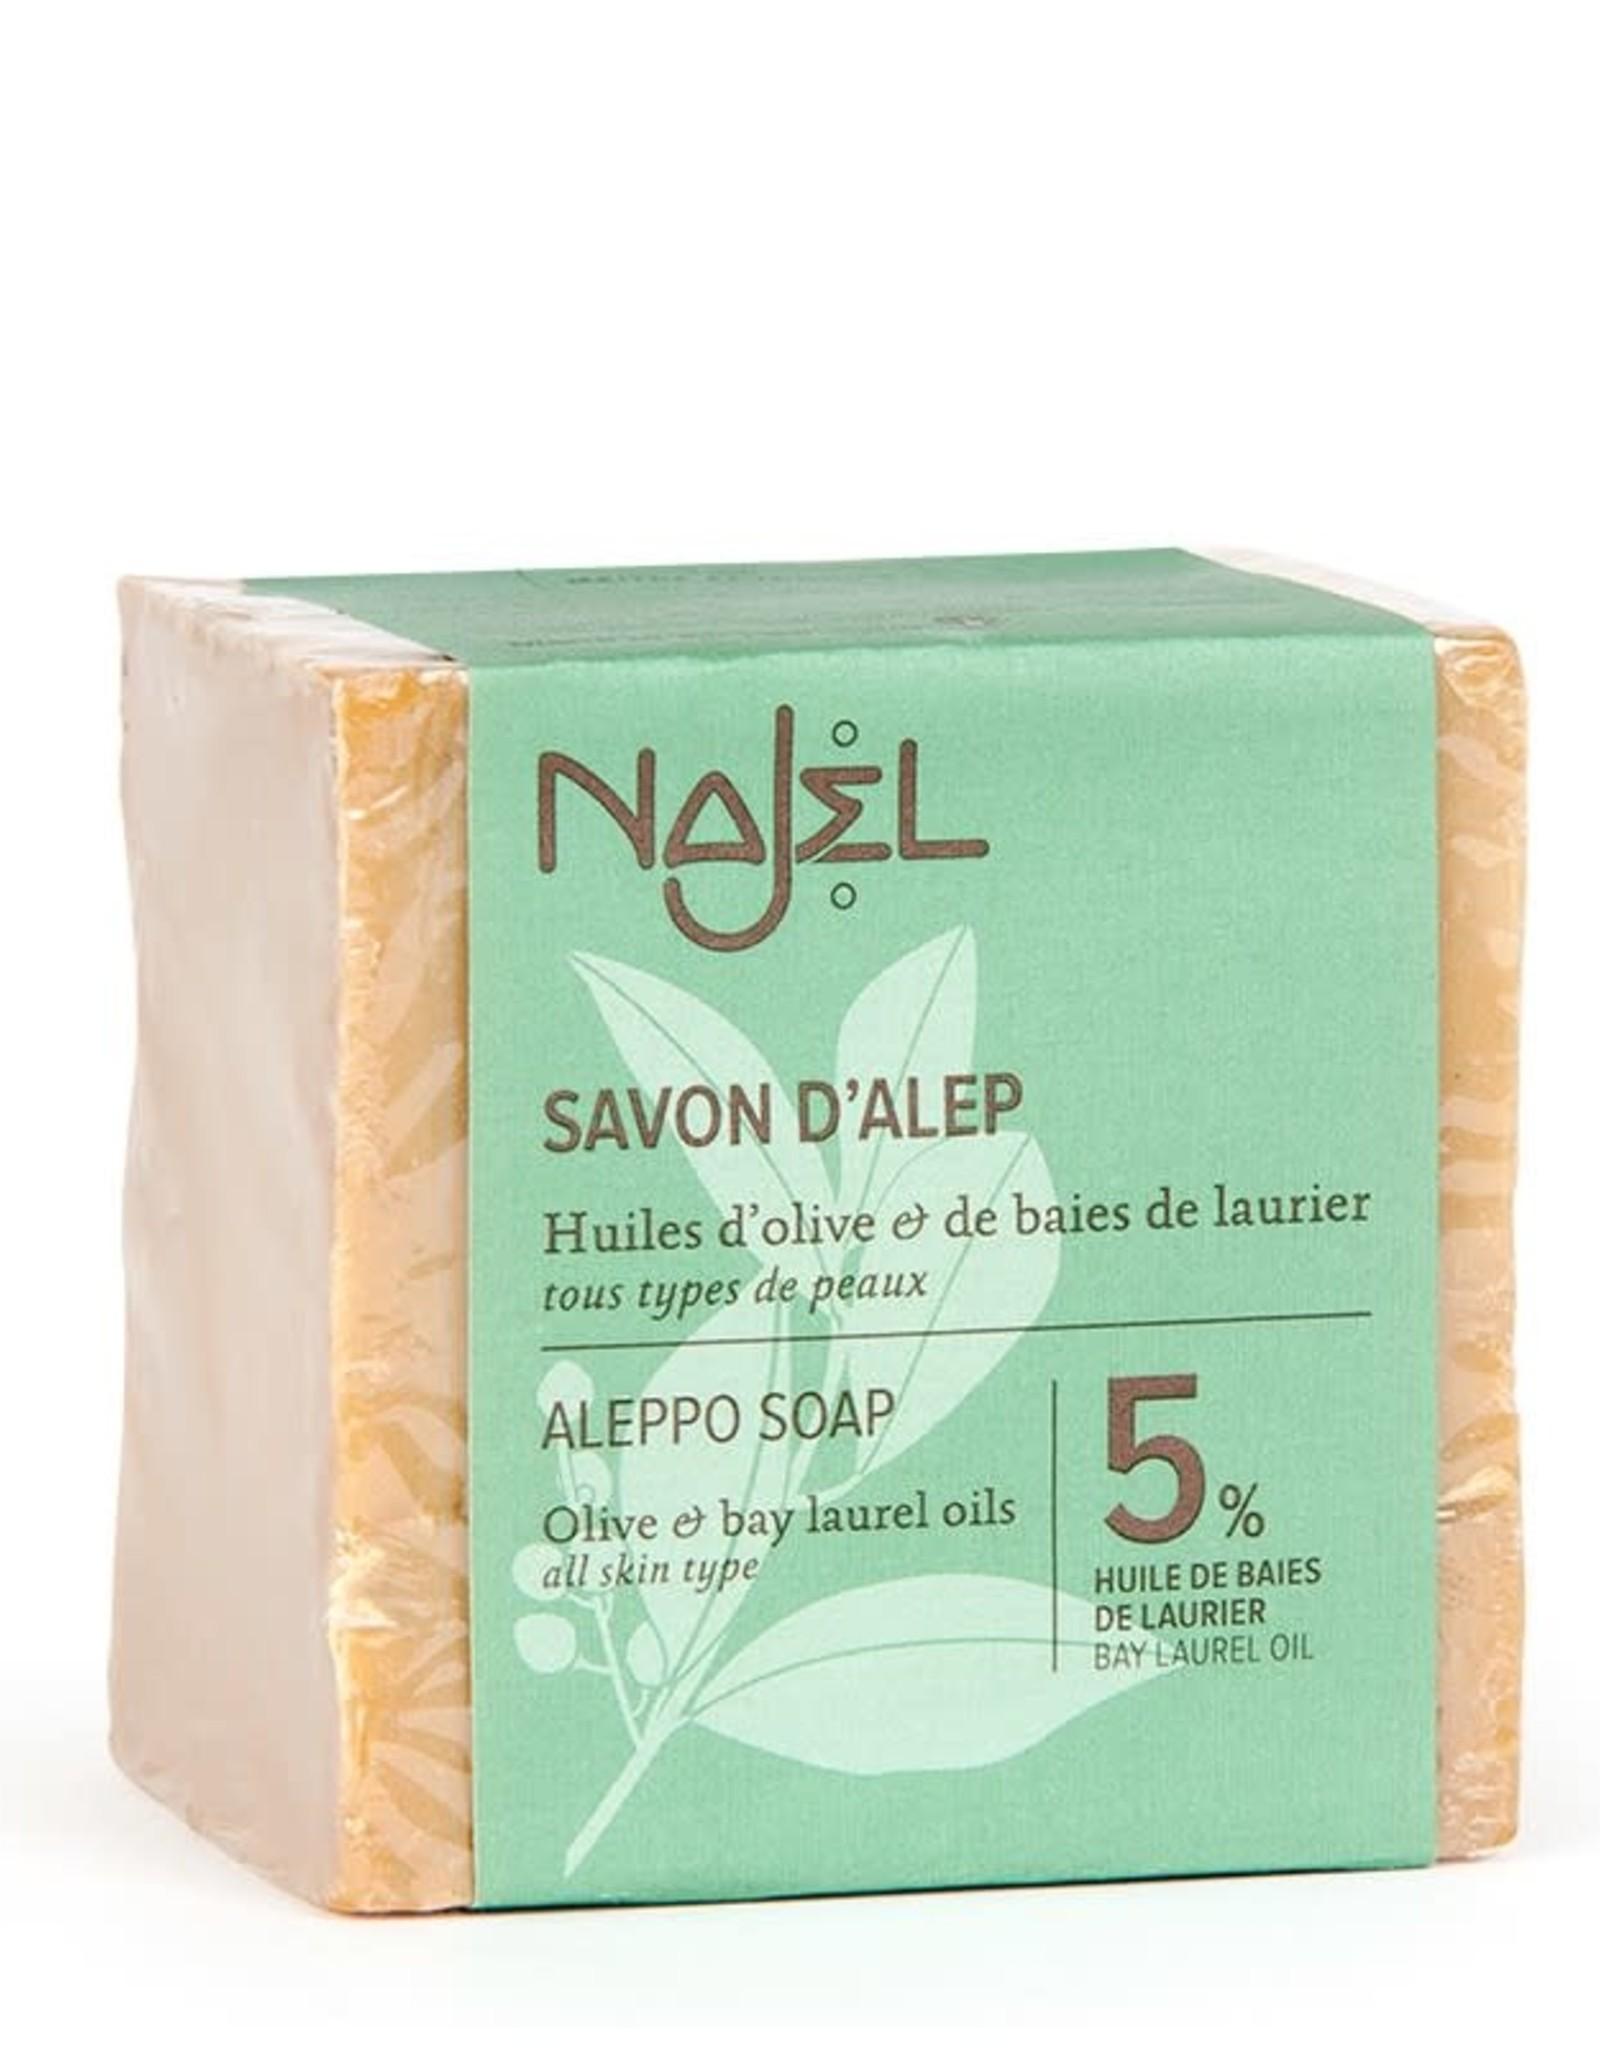 Najel Aleppo zeep olijf + 5% laurierbes 200 g